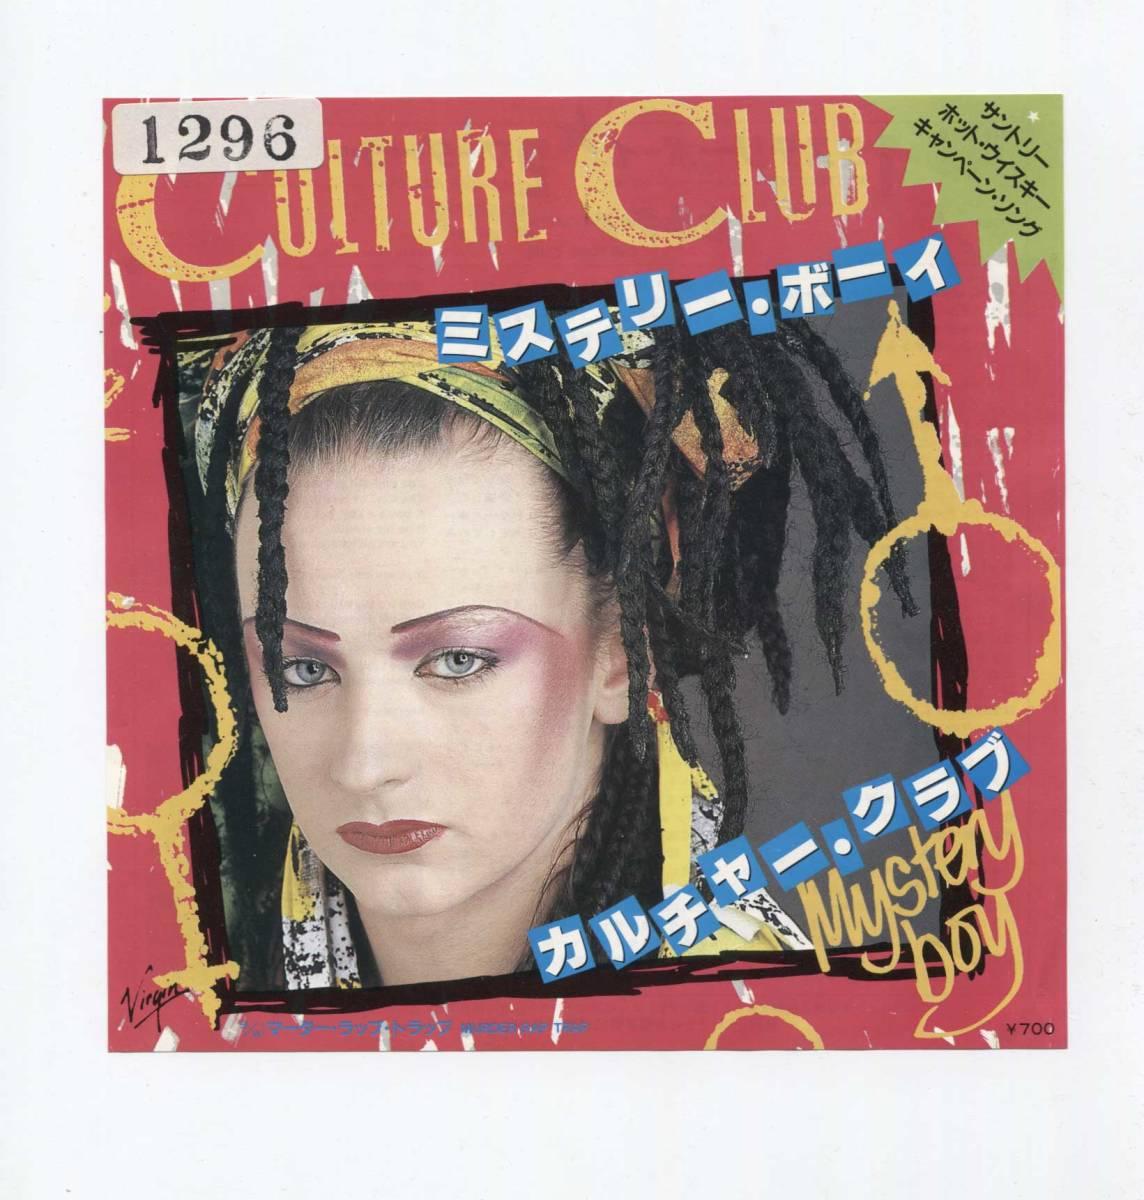 【EP シングル】 稀少! 見本盤 白ラベル ■ CULTURE CLUB ■ MYSTERY BOY ■ カルチャー・クラブ ■ ミステリー・ボーイ PROMO_画像1